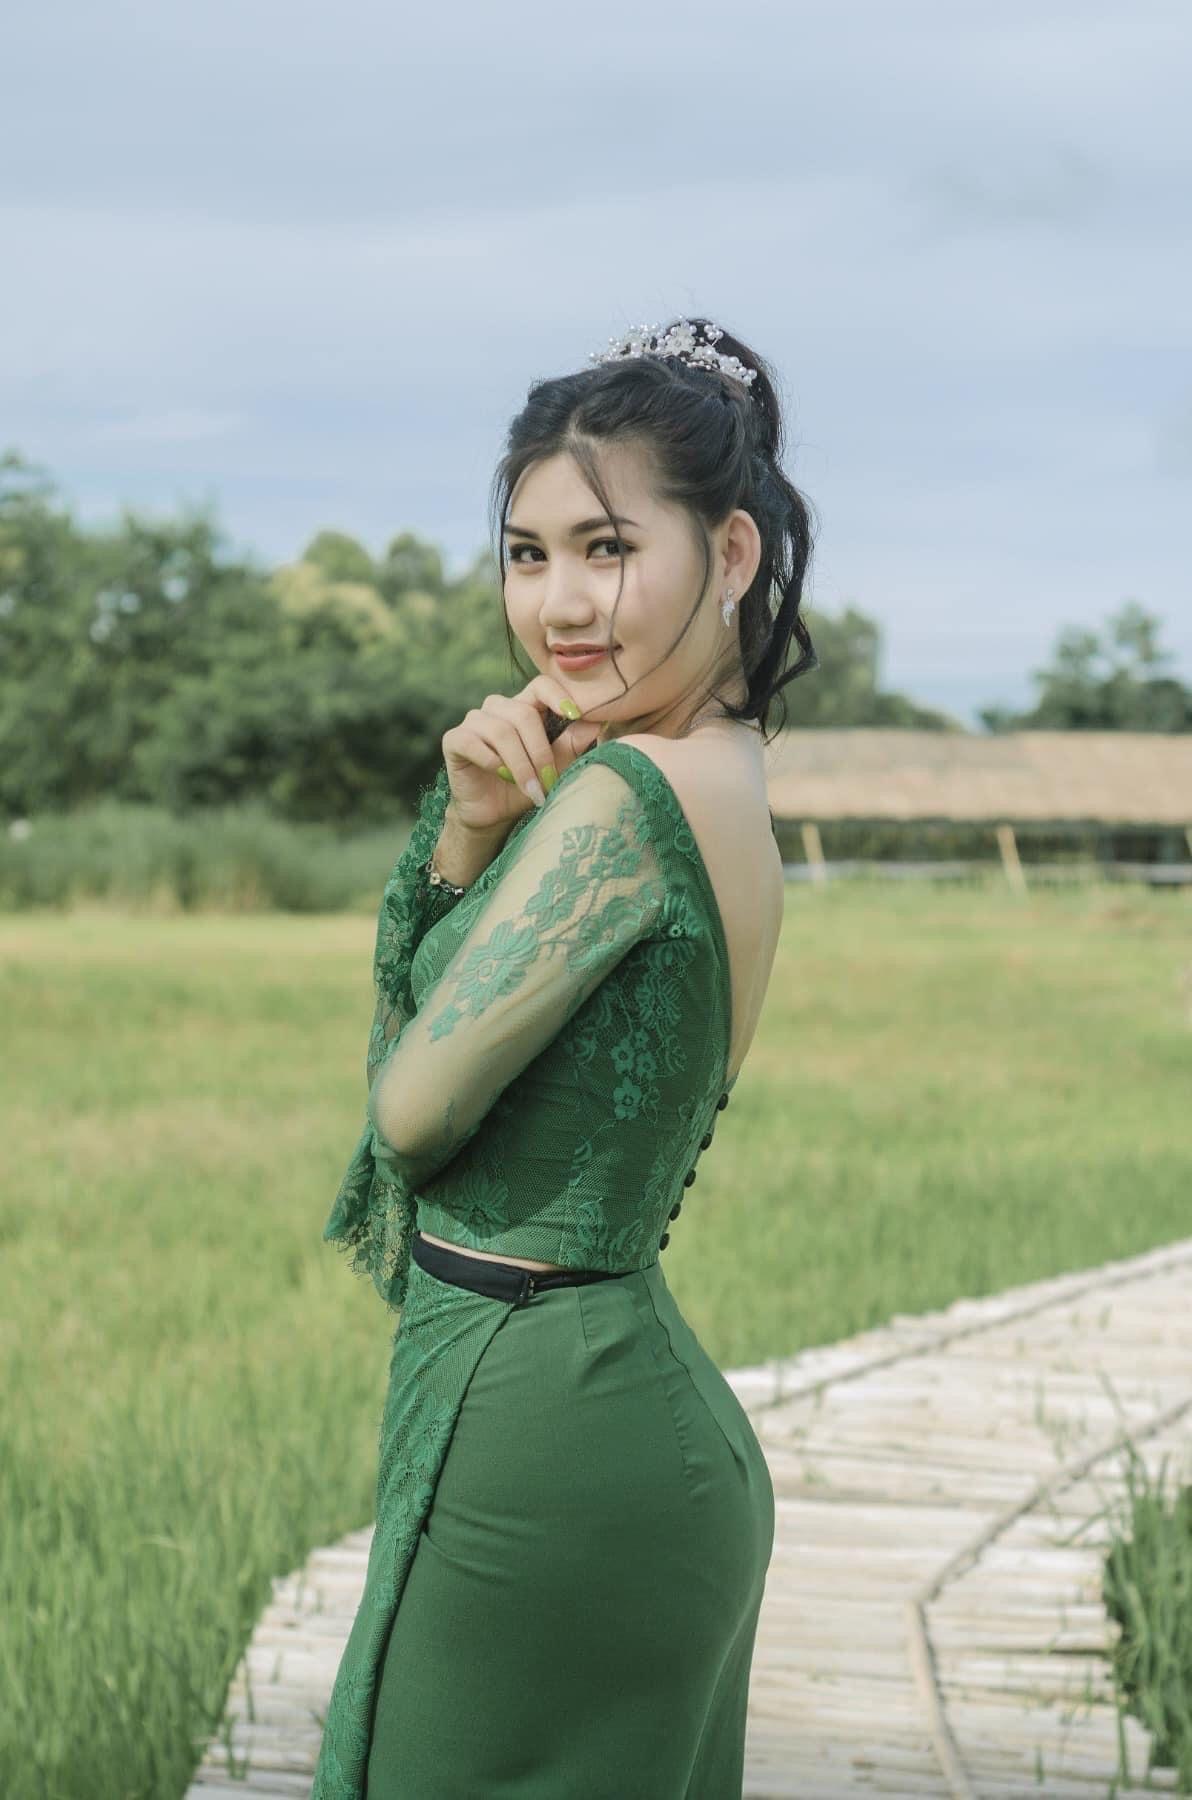 Pin on Myanmar Fashion Models